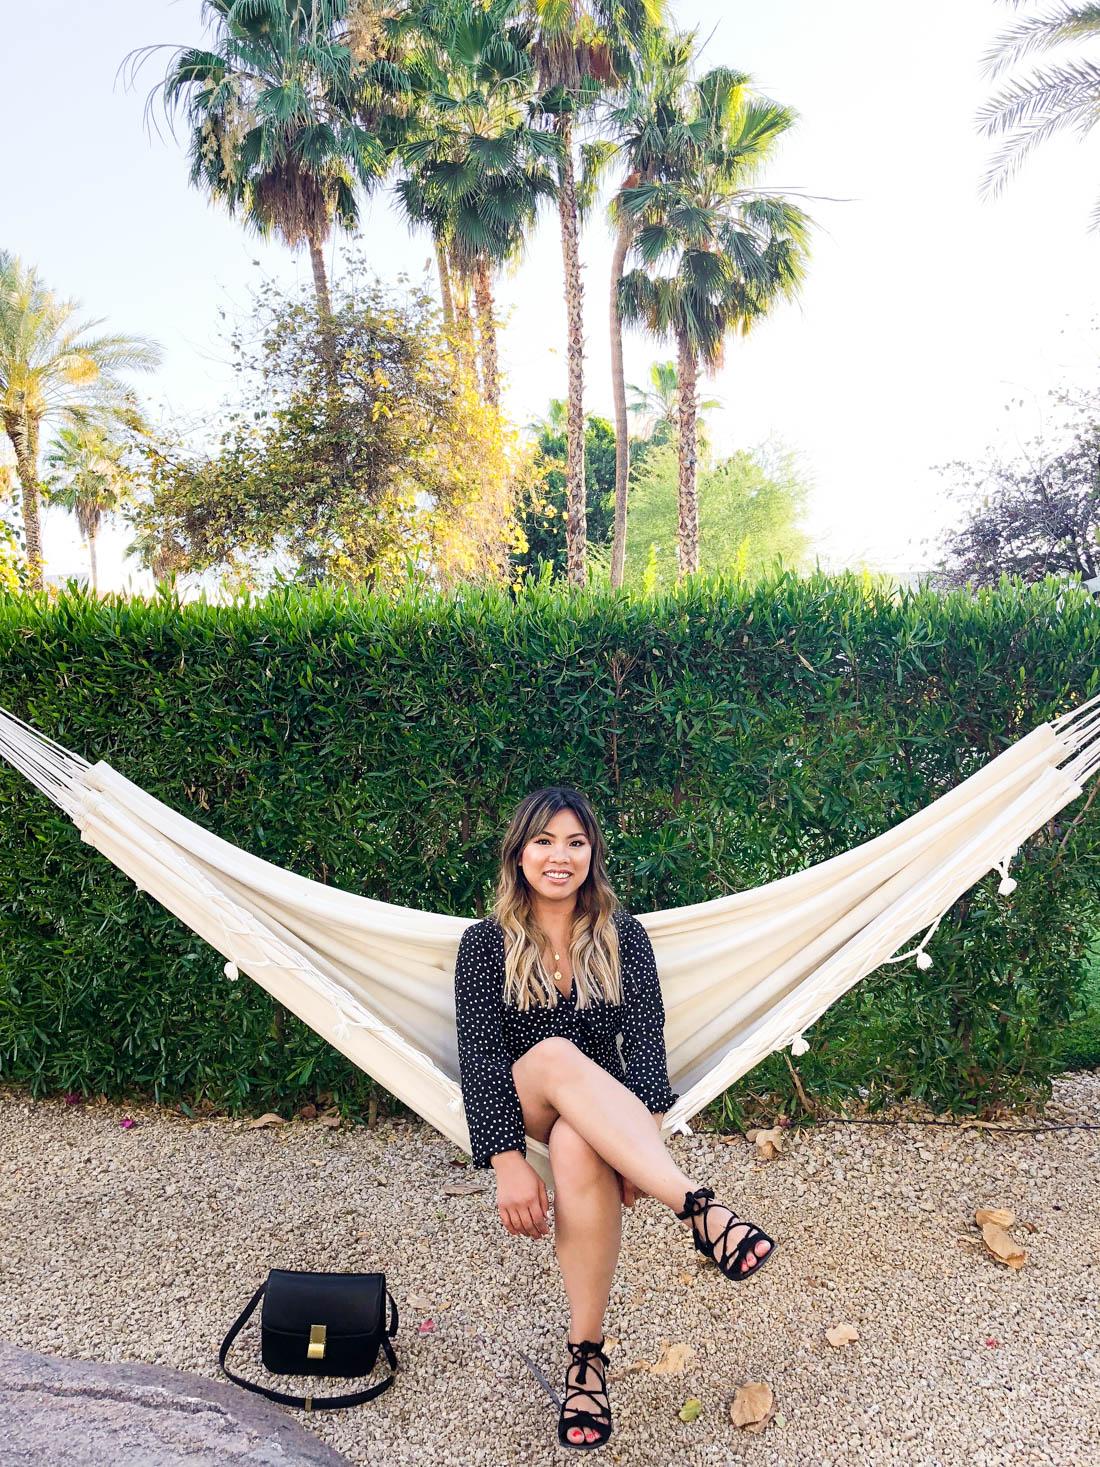 The Scott Resort & Spa | Scottsdale Phoenix Travel Guide & Travel Diary | THE BEAUTY VANITY